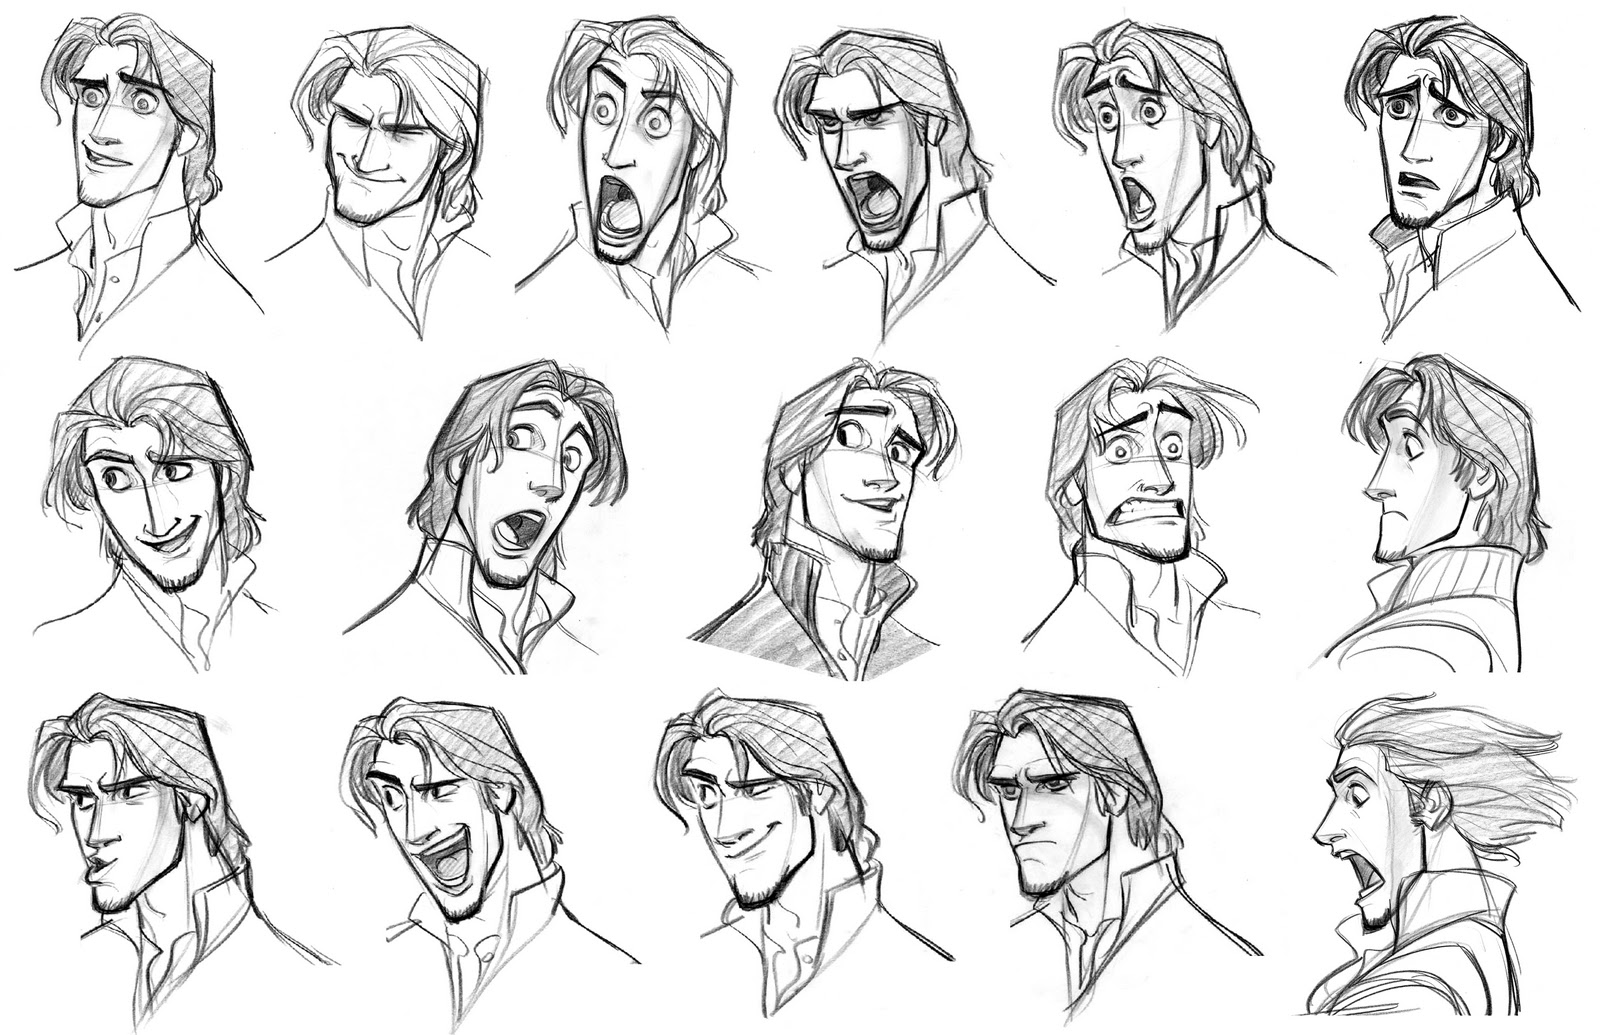 Comic Book Character Design Sheet : Image flynnstudiesgk g disney wiki fandom powered